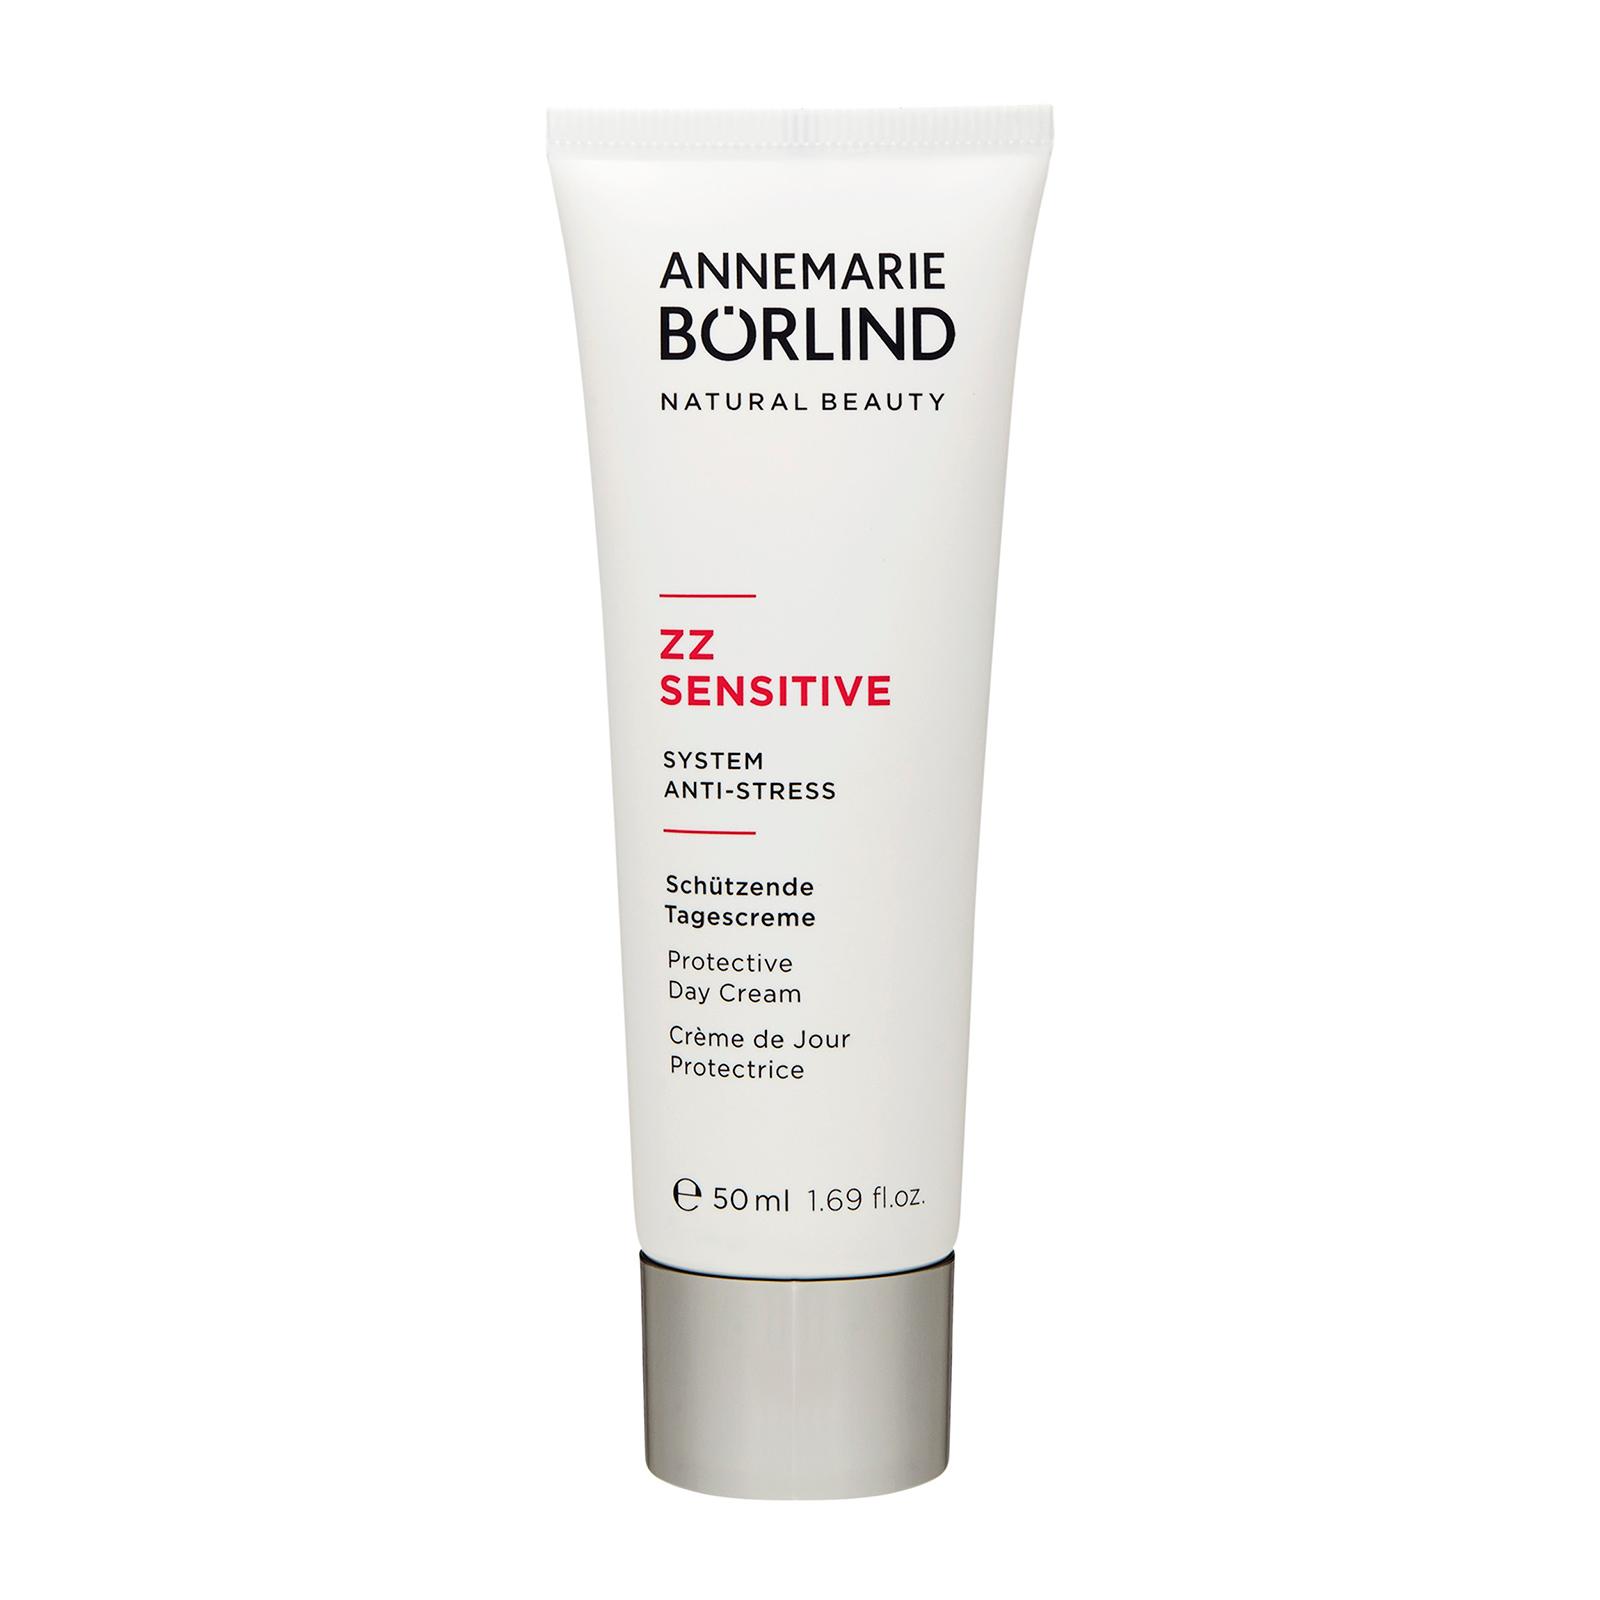 Annemarie Borlind ZZ Sensitive Protective Day Cream 1.69oz, 50ml